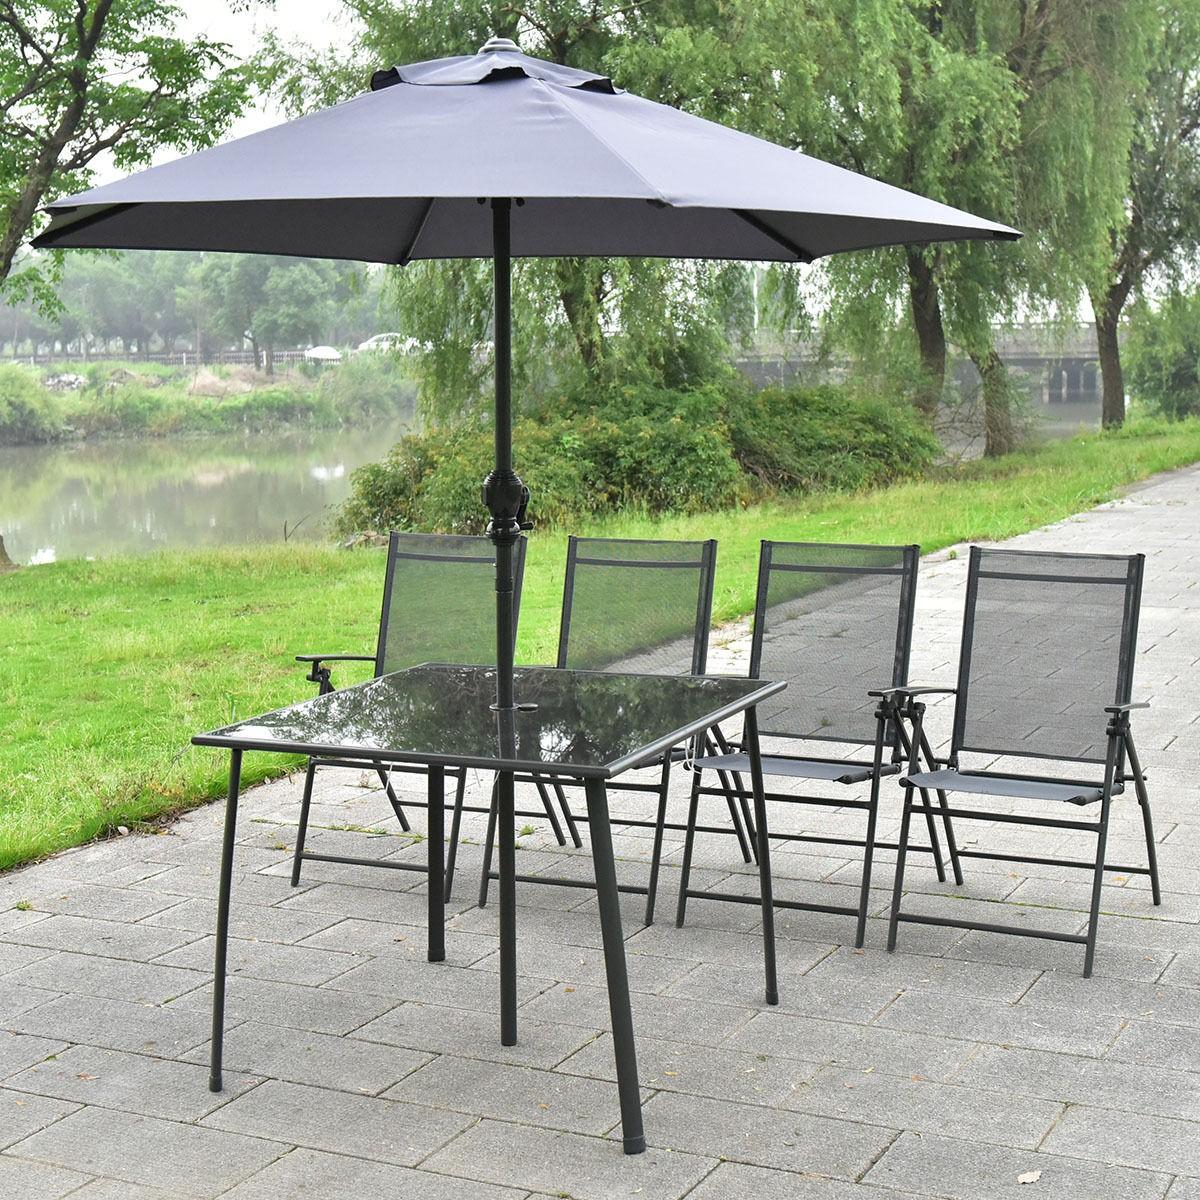 6pc patio garden set furniture 4 folding chairs table with umbrella us ship gray ebay - Garden table with umbrella ...